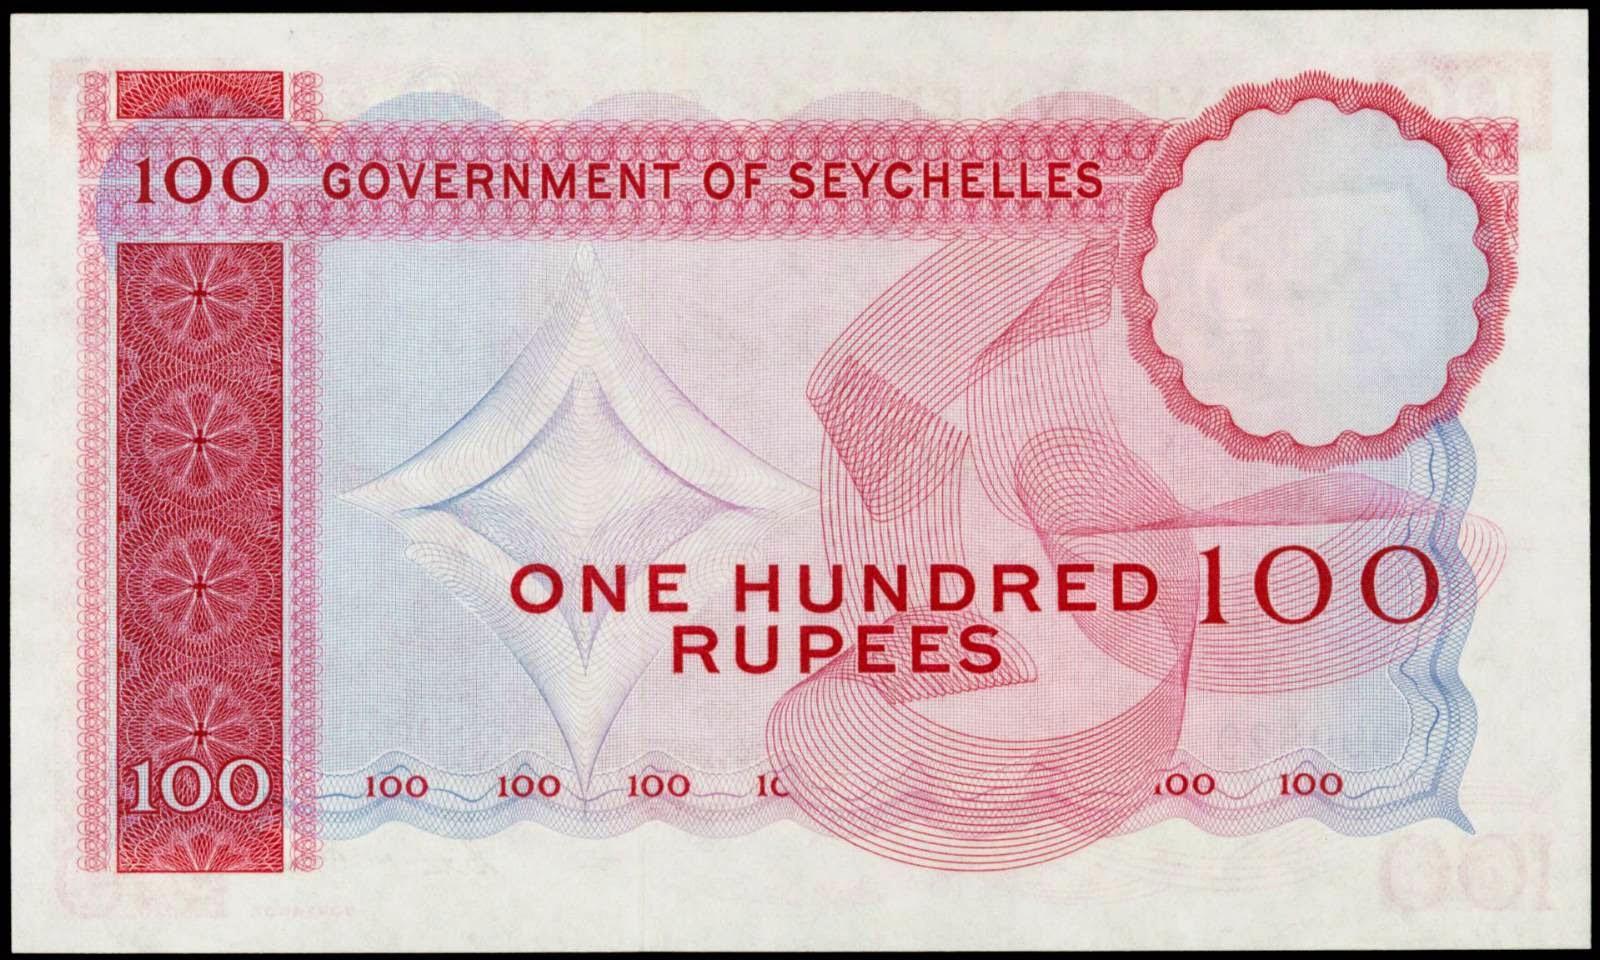 Seychelles paper money One Hundred Rupees